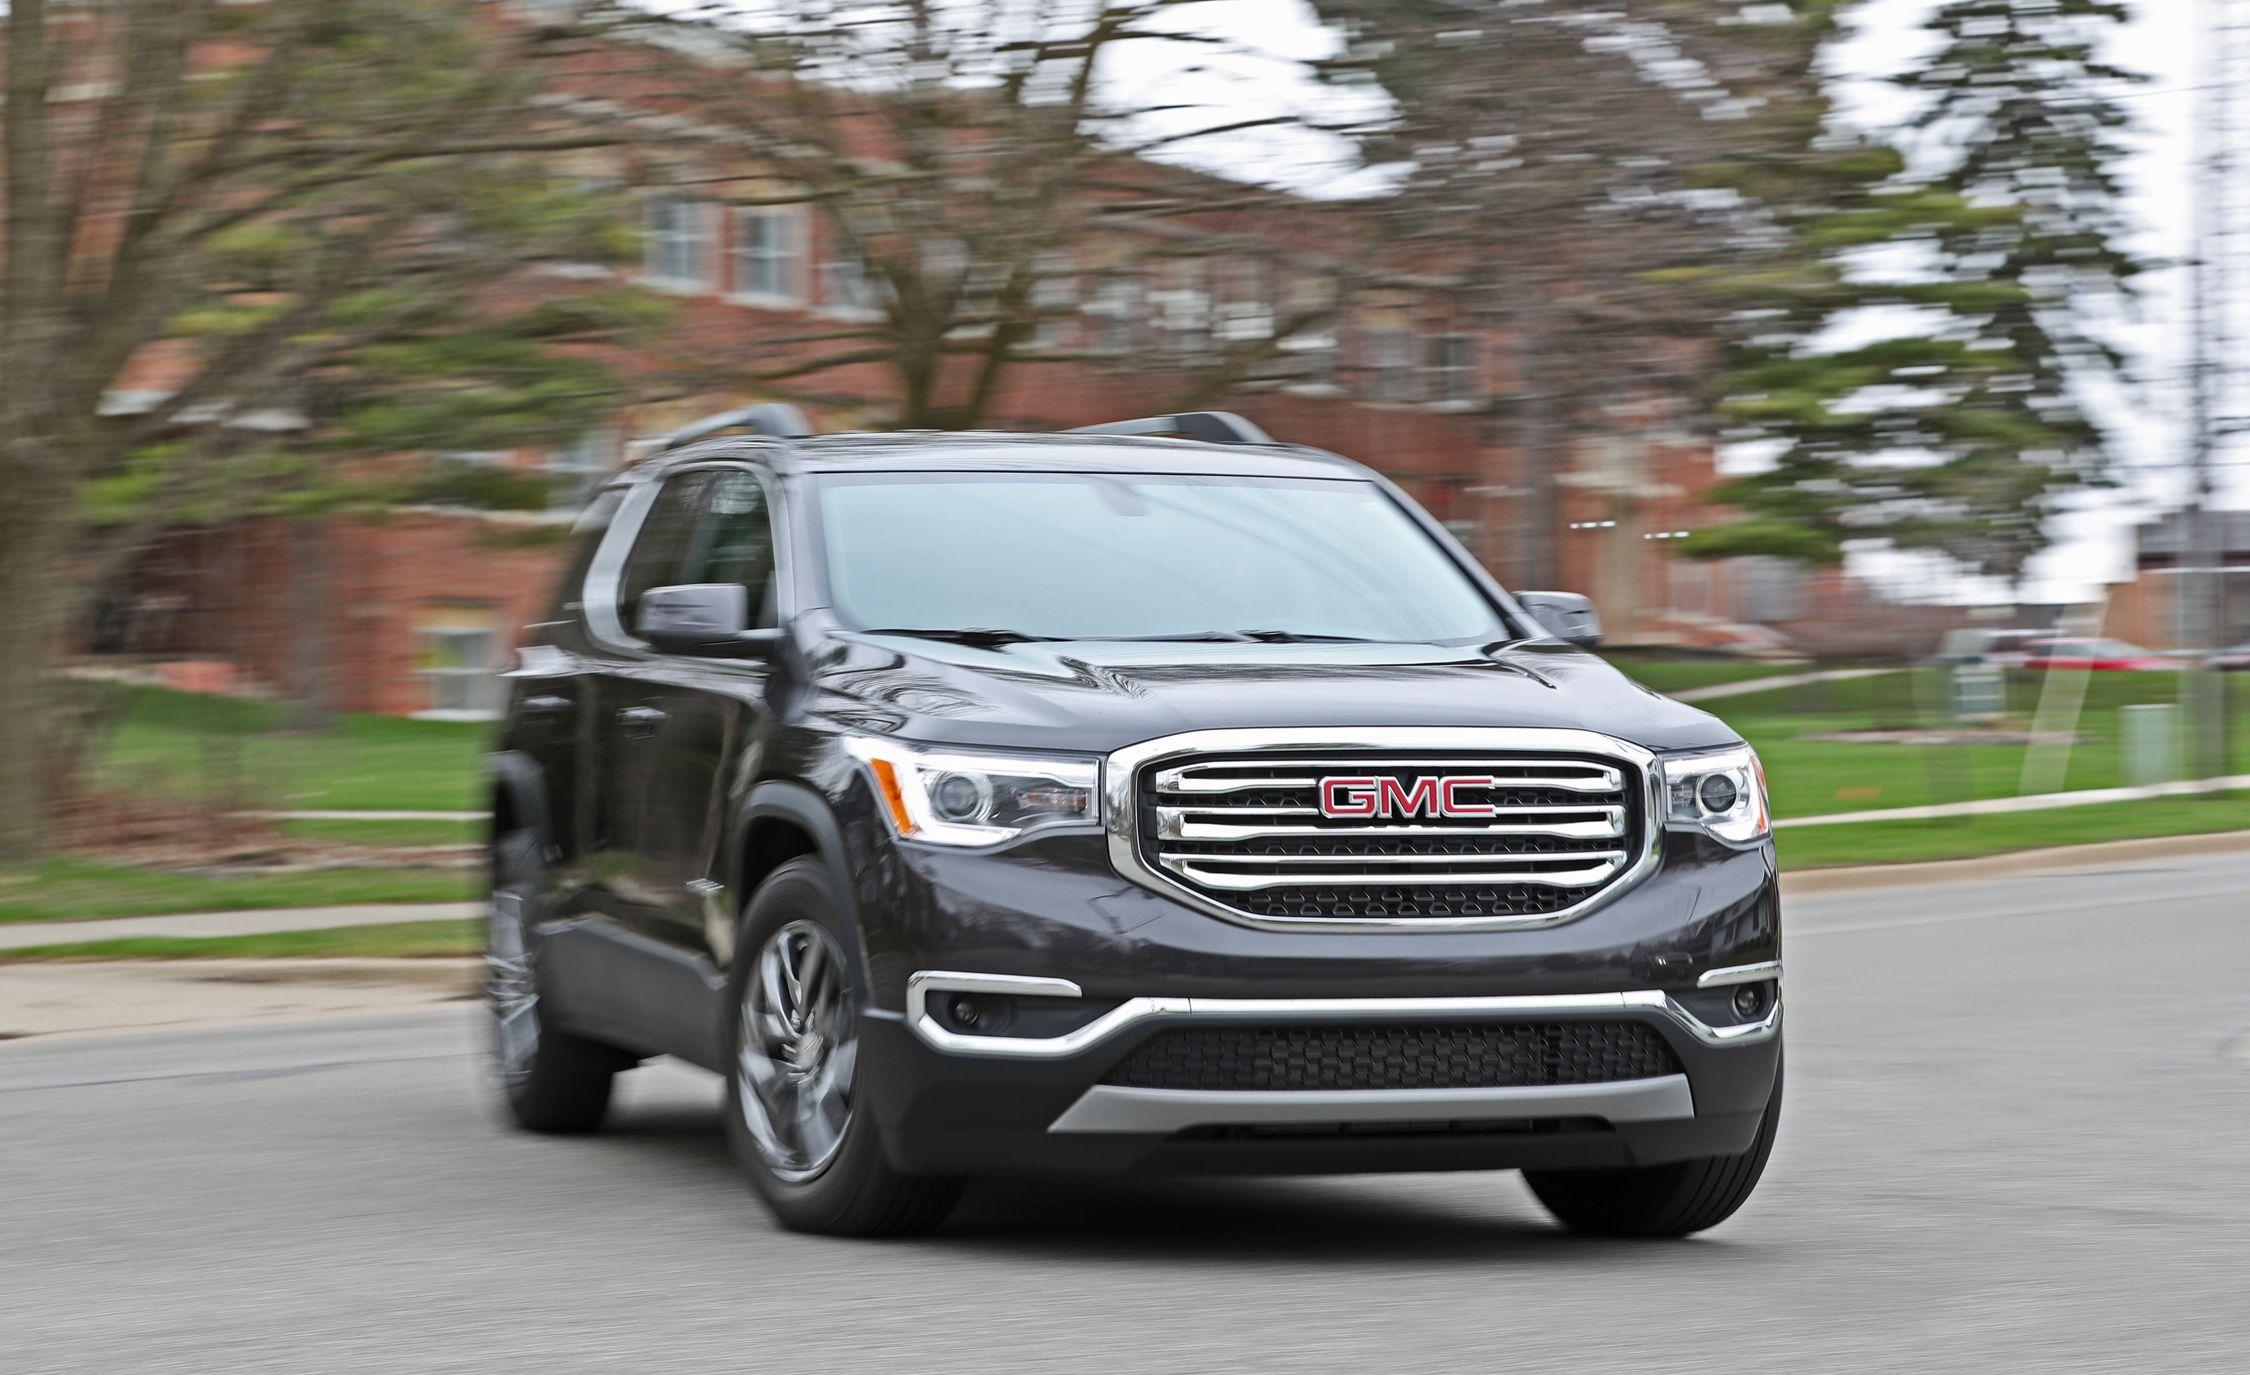 GMC Acadia Reviews | GMC Acadia Price, Photos, and Specs | Car and Driver